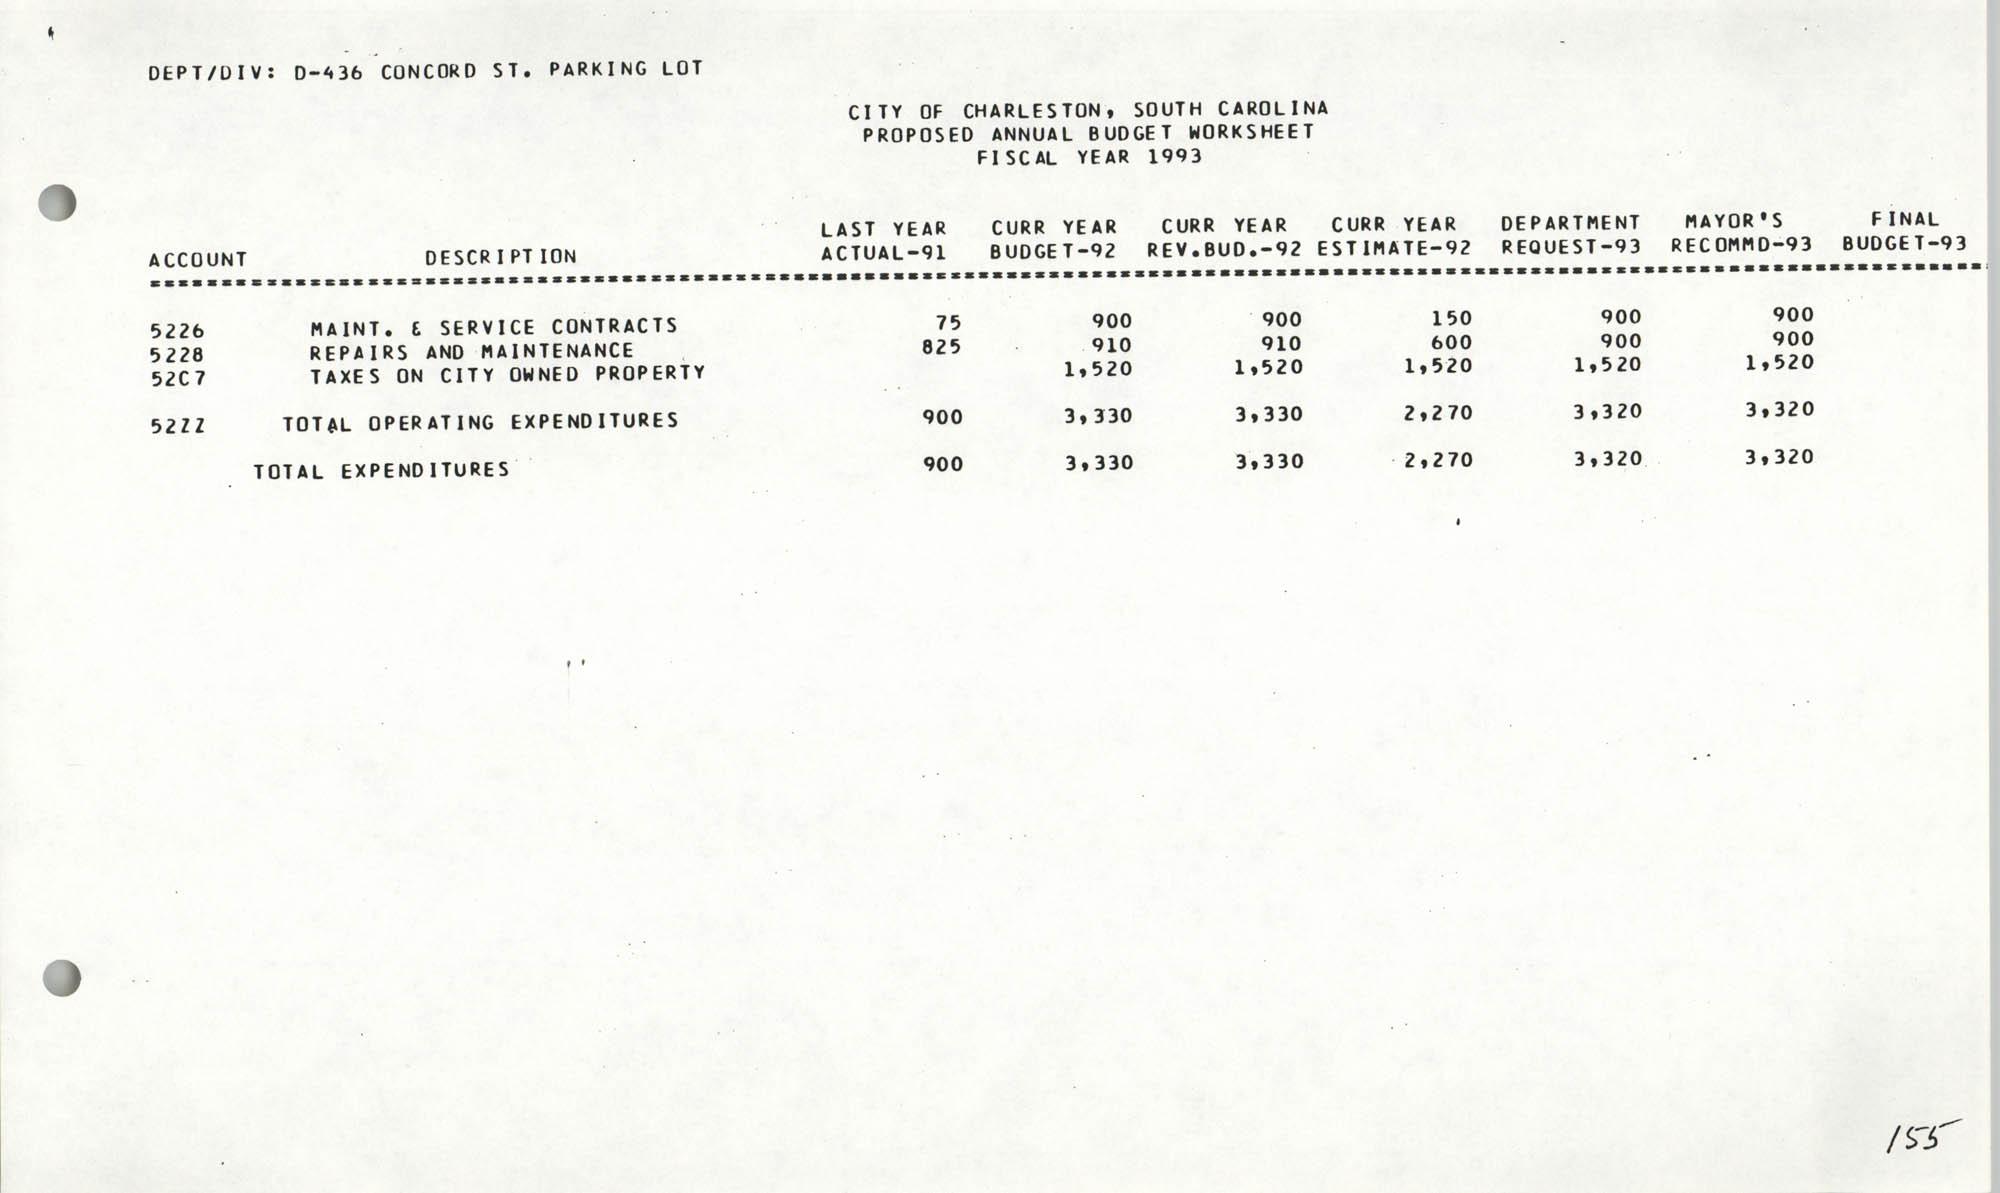 The City Council of Charleston, South Carolina, 1993 Budget, Page 155